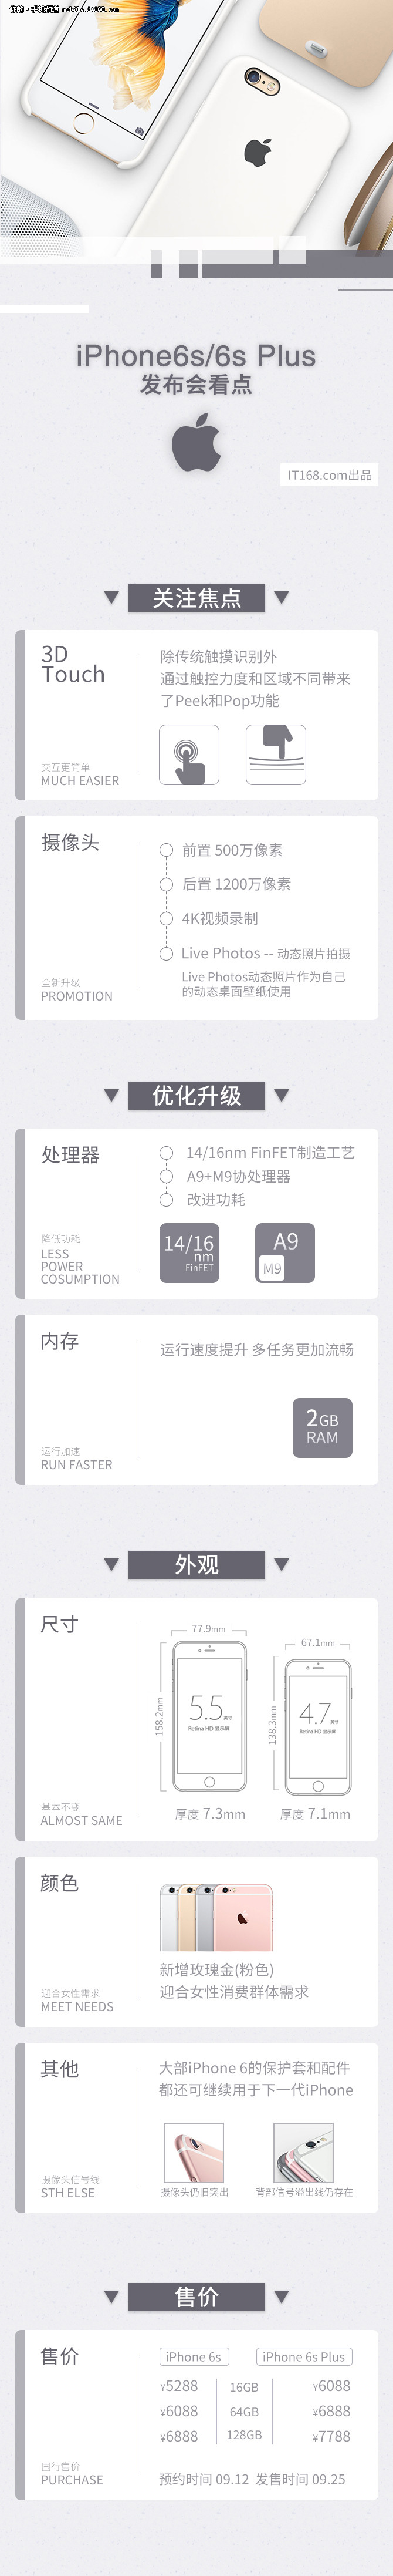 3D触控 一张图读懂iPhone 6s6s Plus